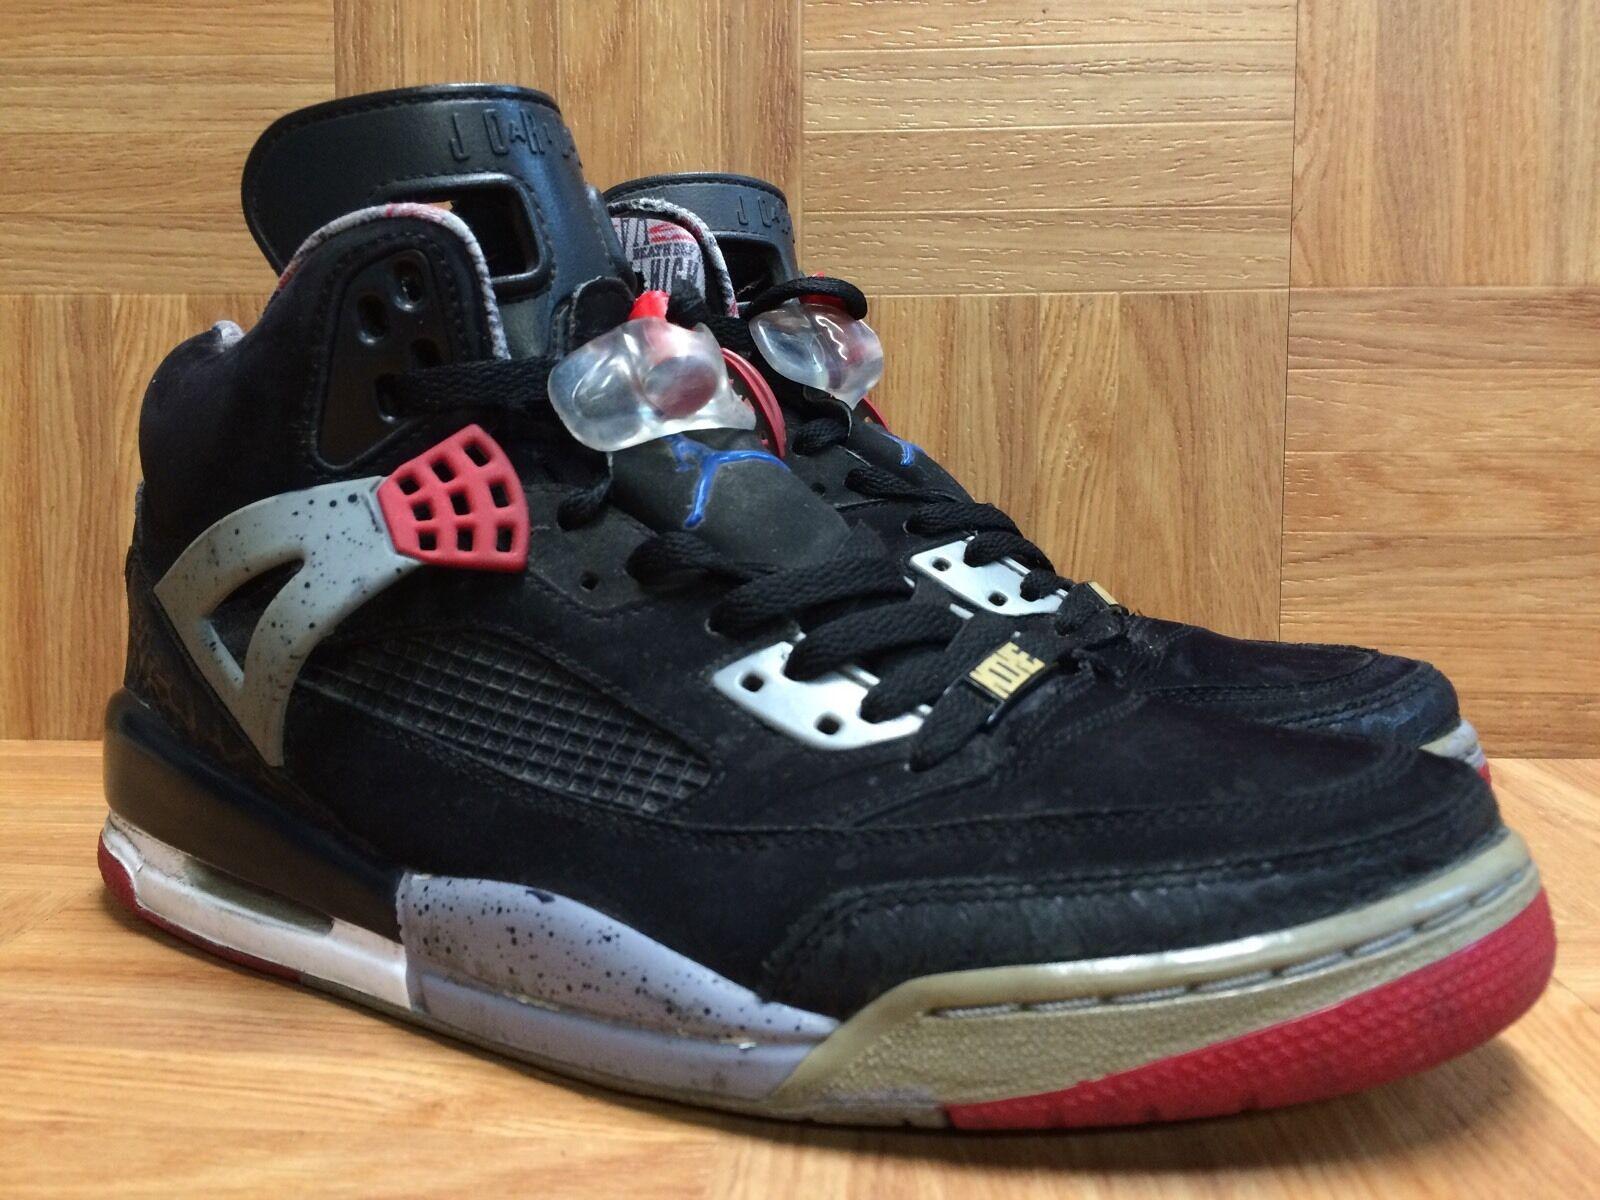 RARE Nike Air Jordan Spizike Black Red Cement Military bluee 315371-062 Sz 9.5